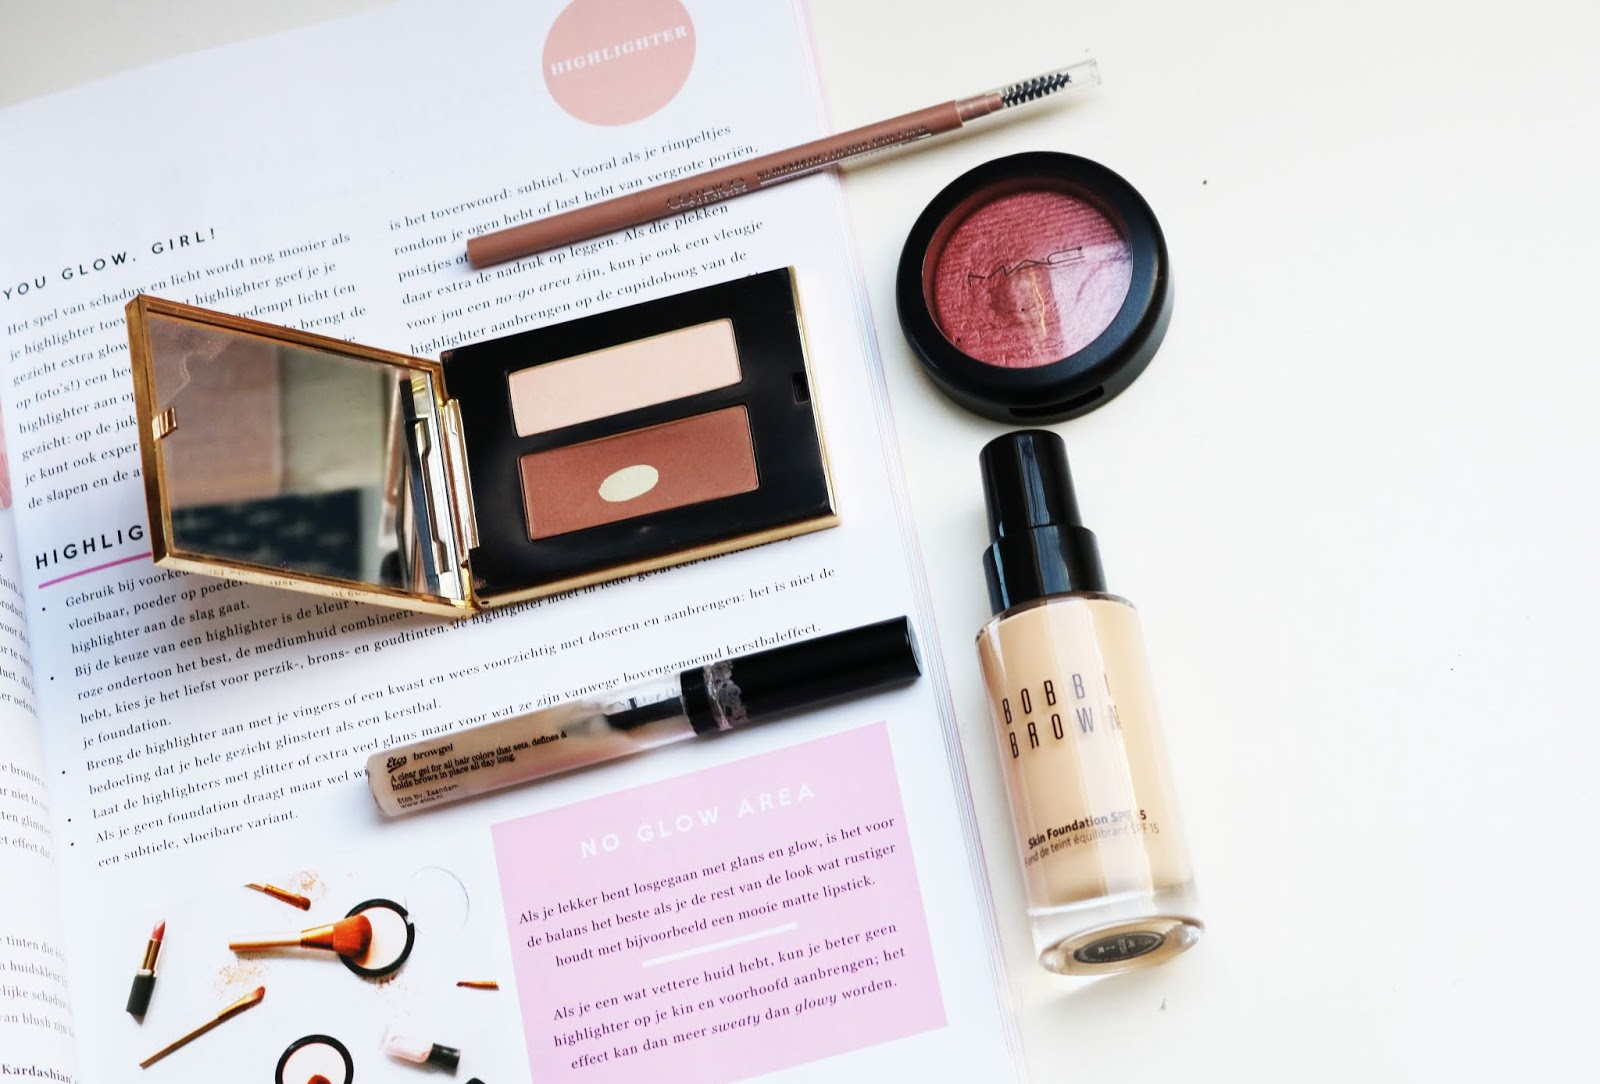 Beauty | Mijn favoriete make-up producten! (Budget, en high-end)